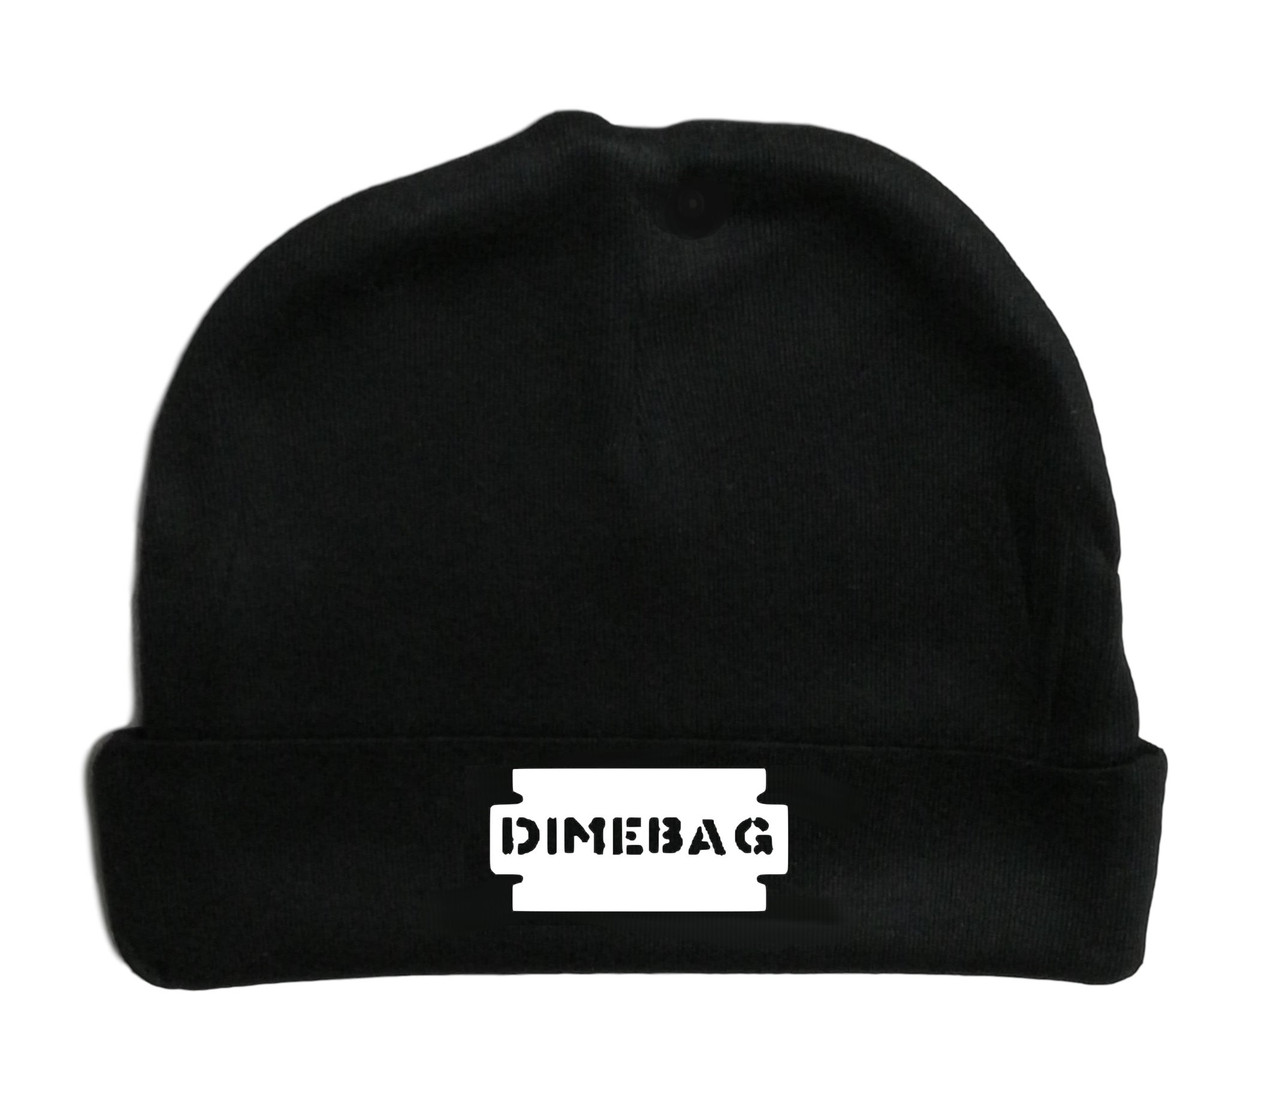 Dimebag Thrashing Darrell Metal Rock & Roll Infant Baby Beanie Cap White Logo